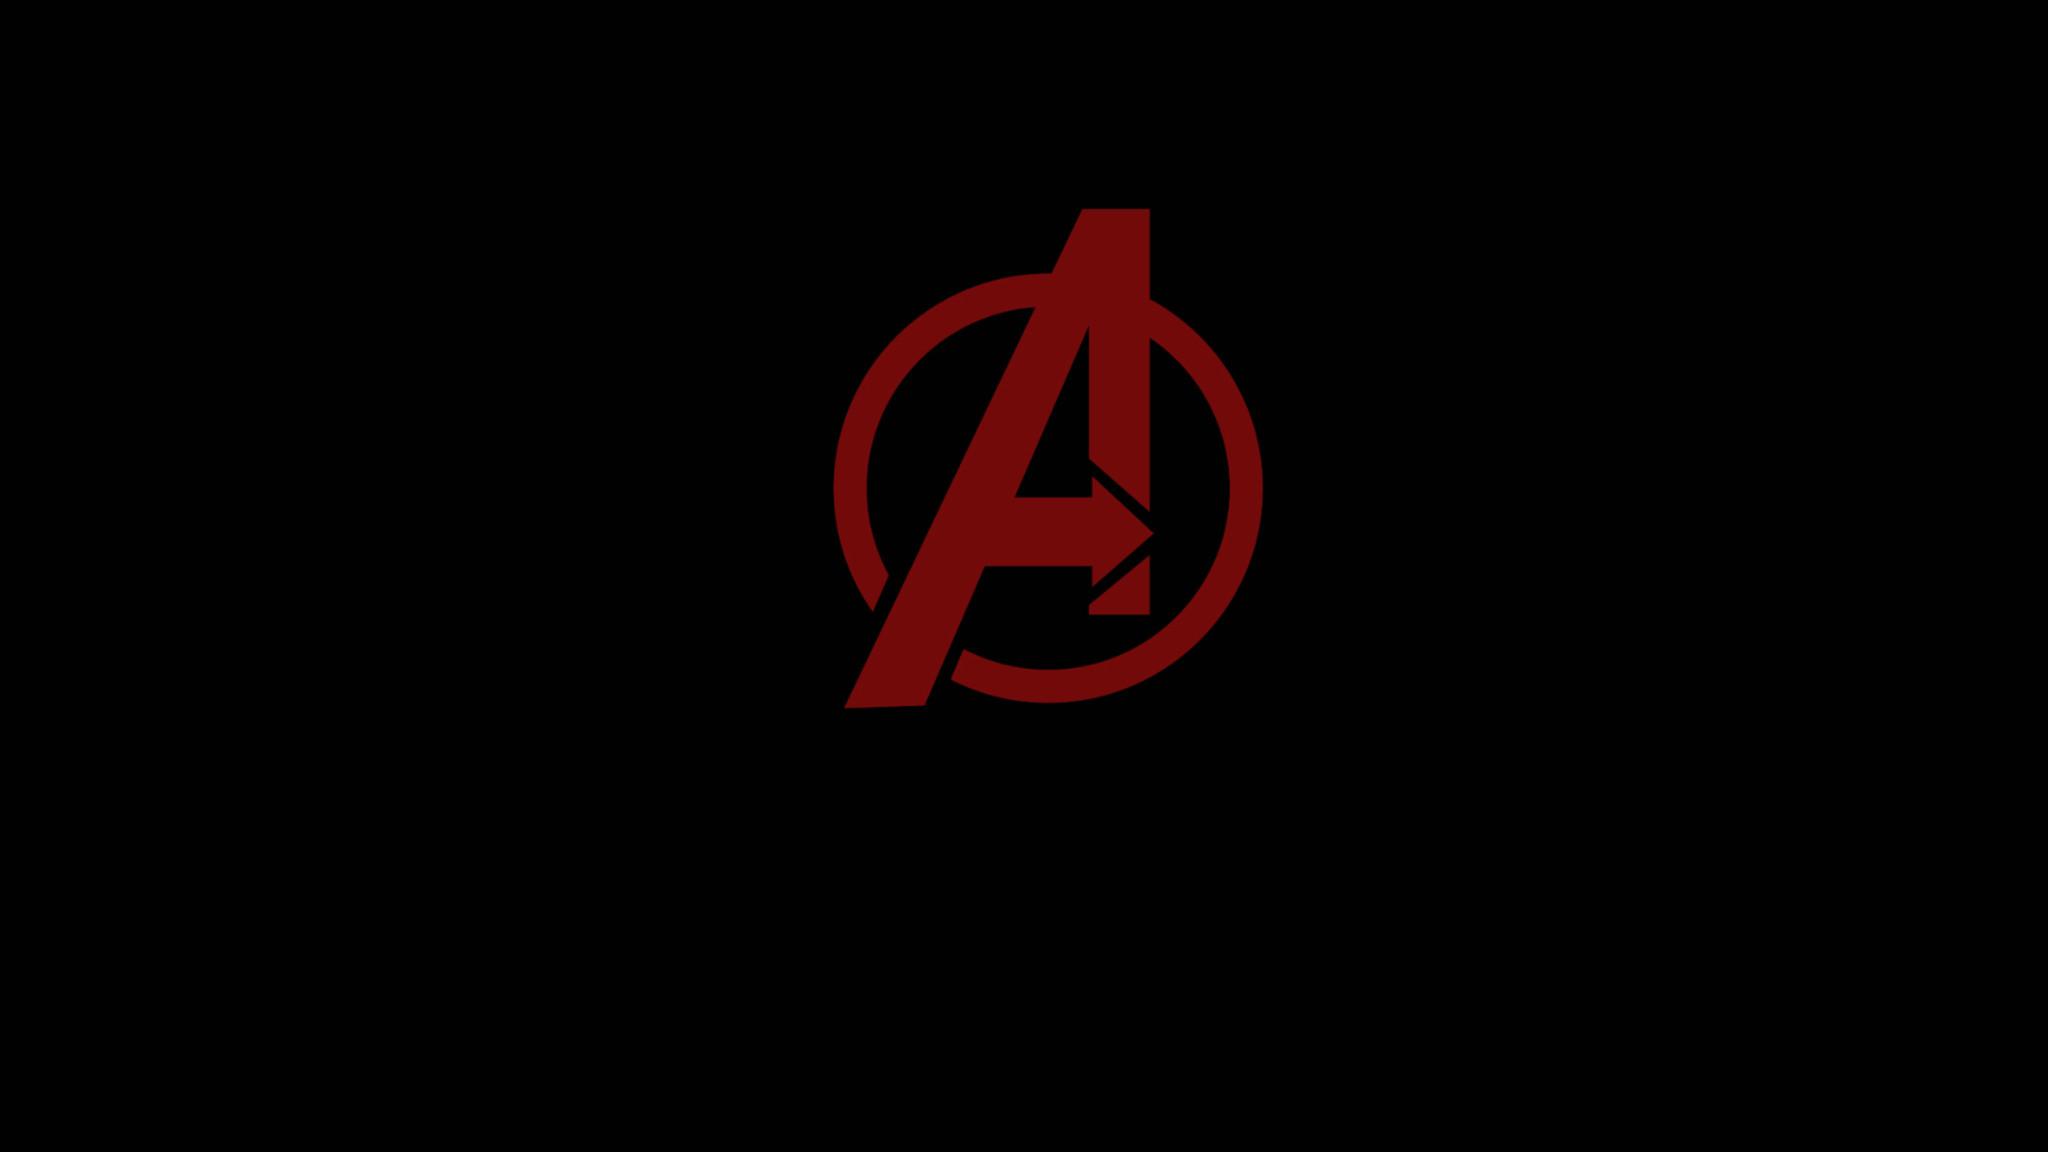 Res: 2048x1152, avengers-minimal-logo-qp.jpg